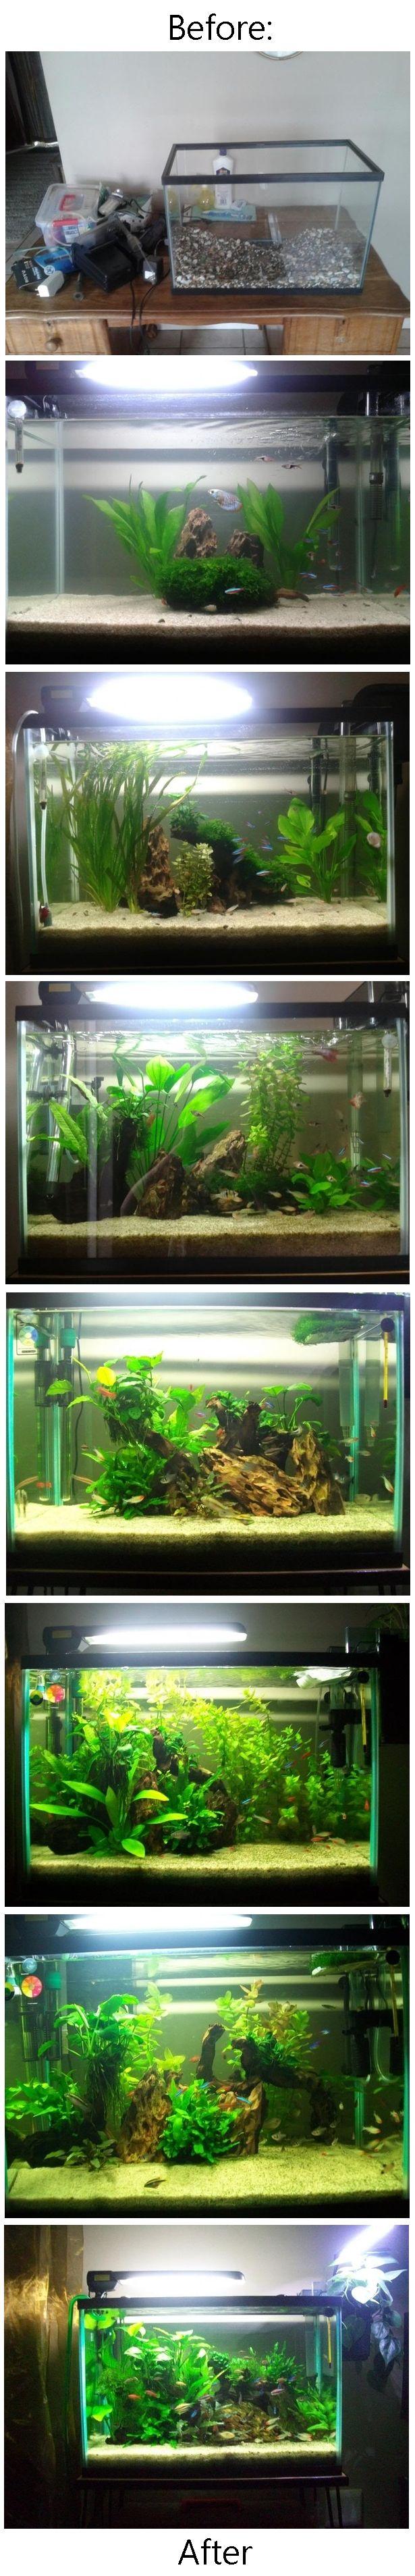 Aquarium fish tank setup - The Evolution Of My Tropical Fish Tank Setup